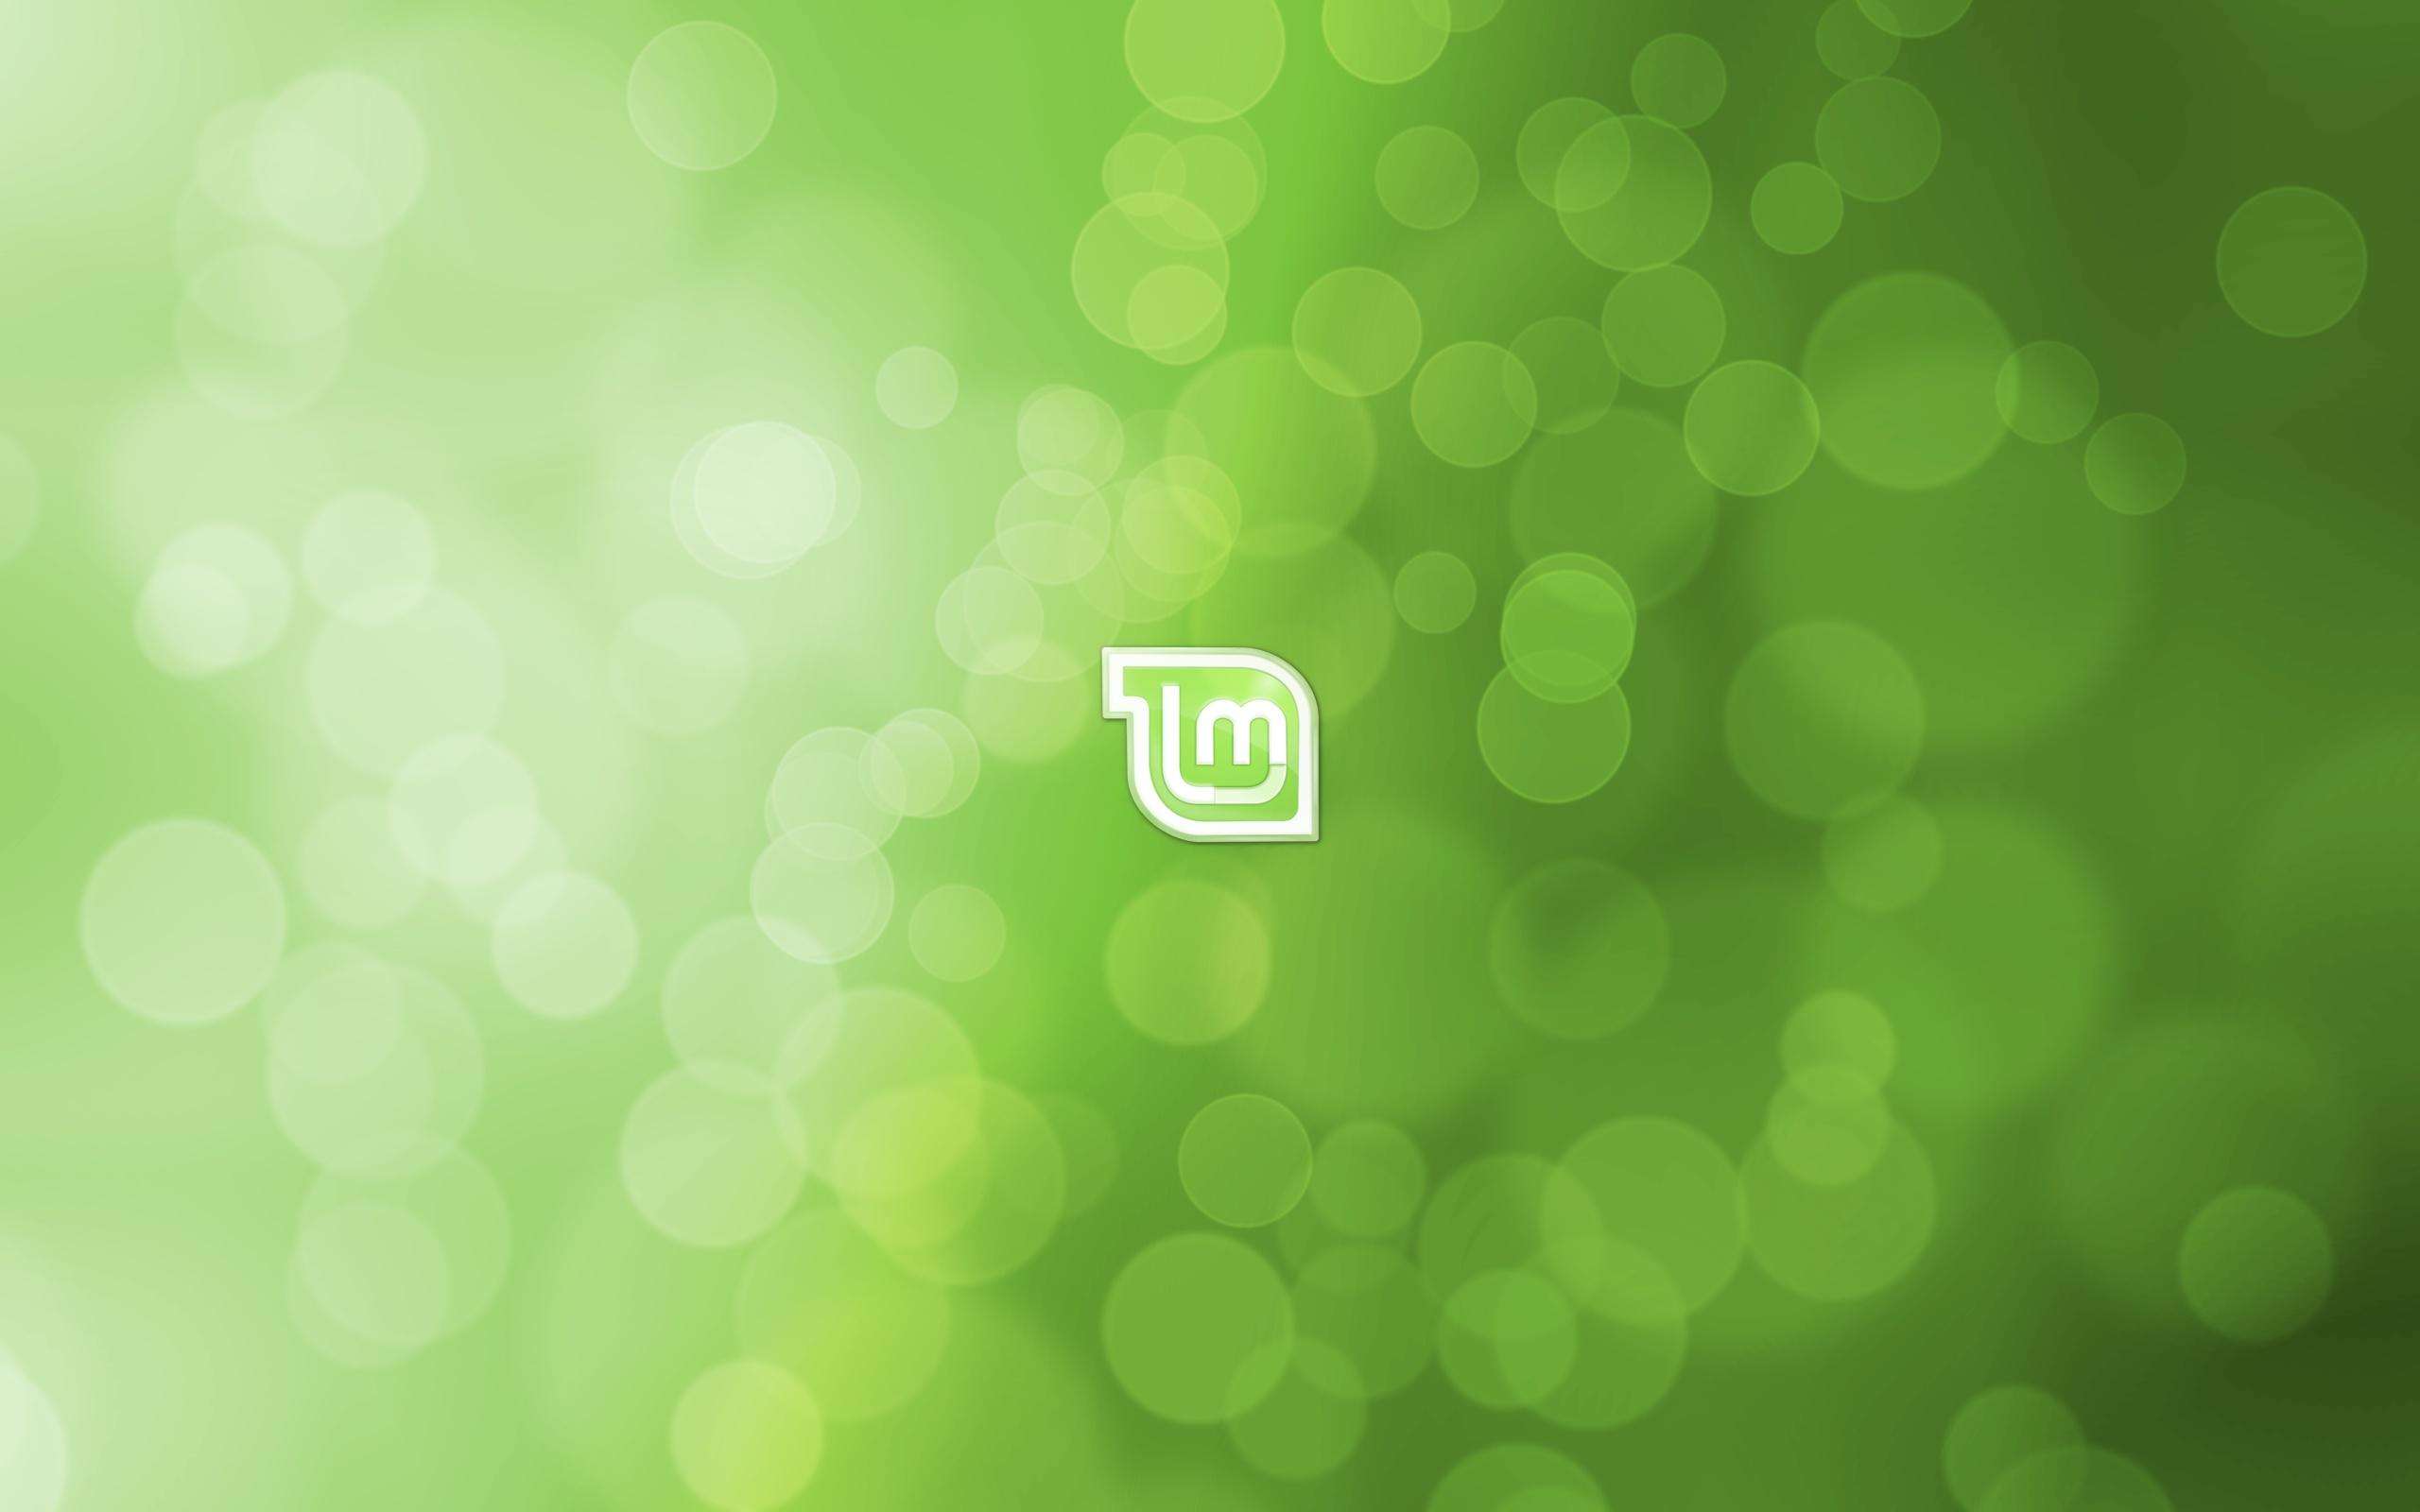 001 Beautiful Linux Mint Logo Image HD Wallpaper Picture And Desktop 2560x1600